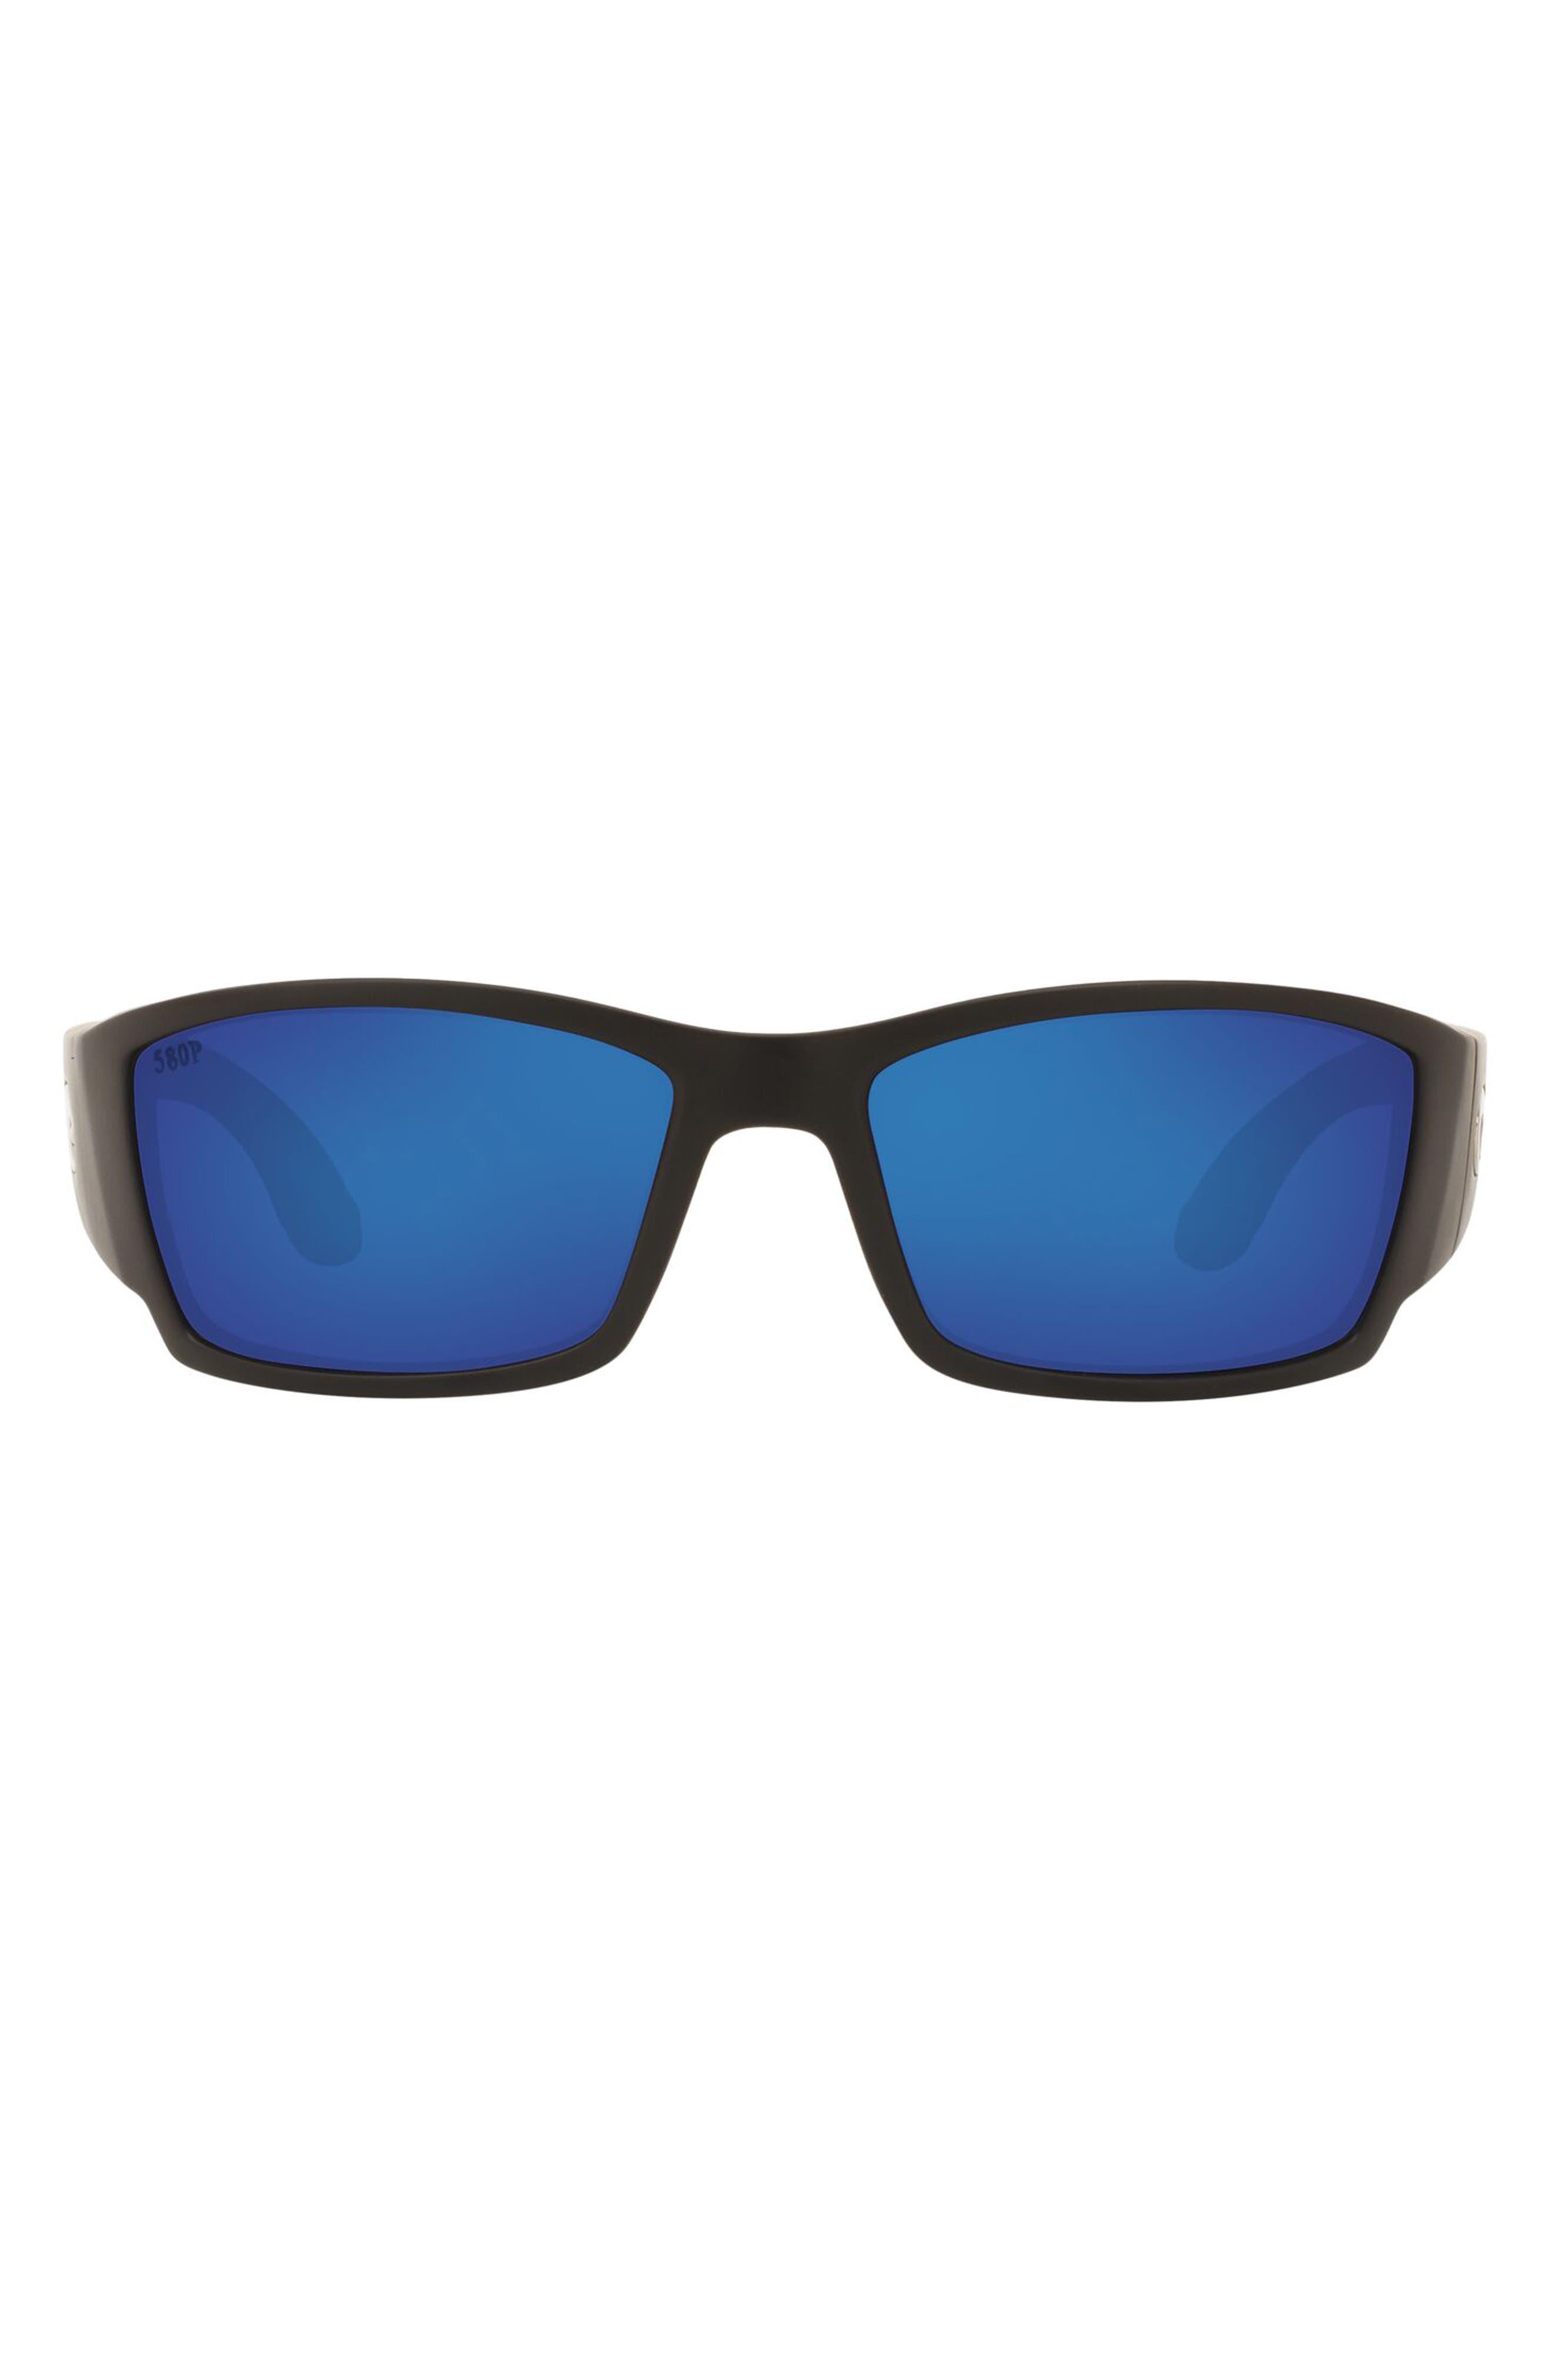 61mm Polarized Wraparound Sunglasses